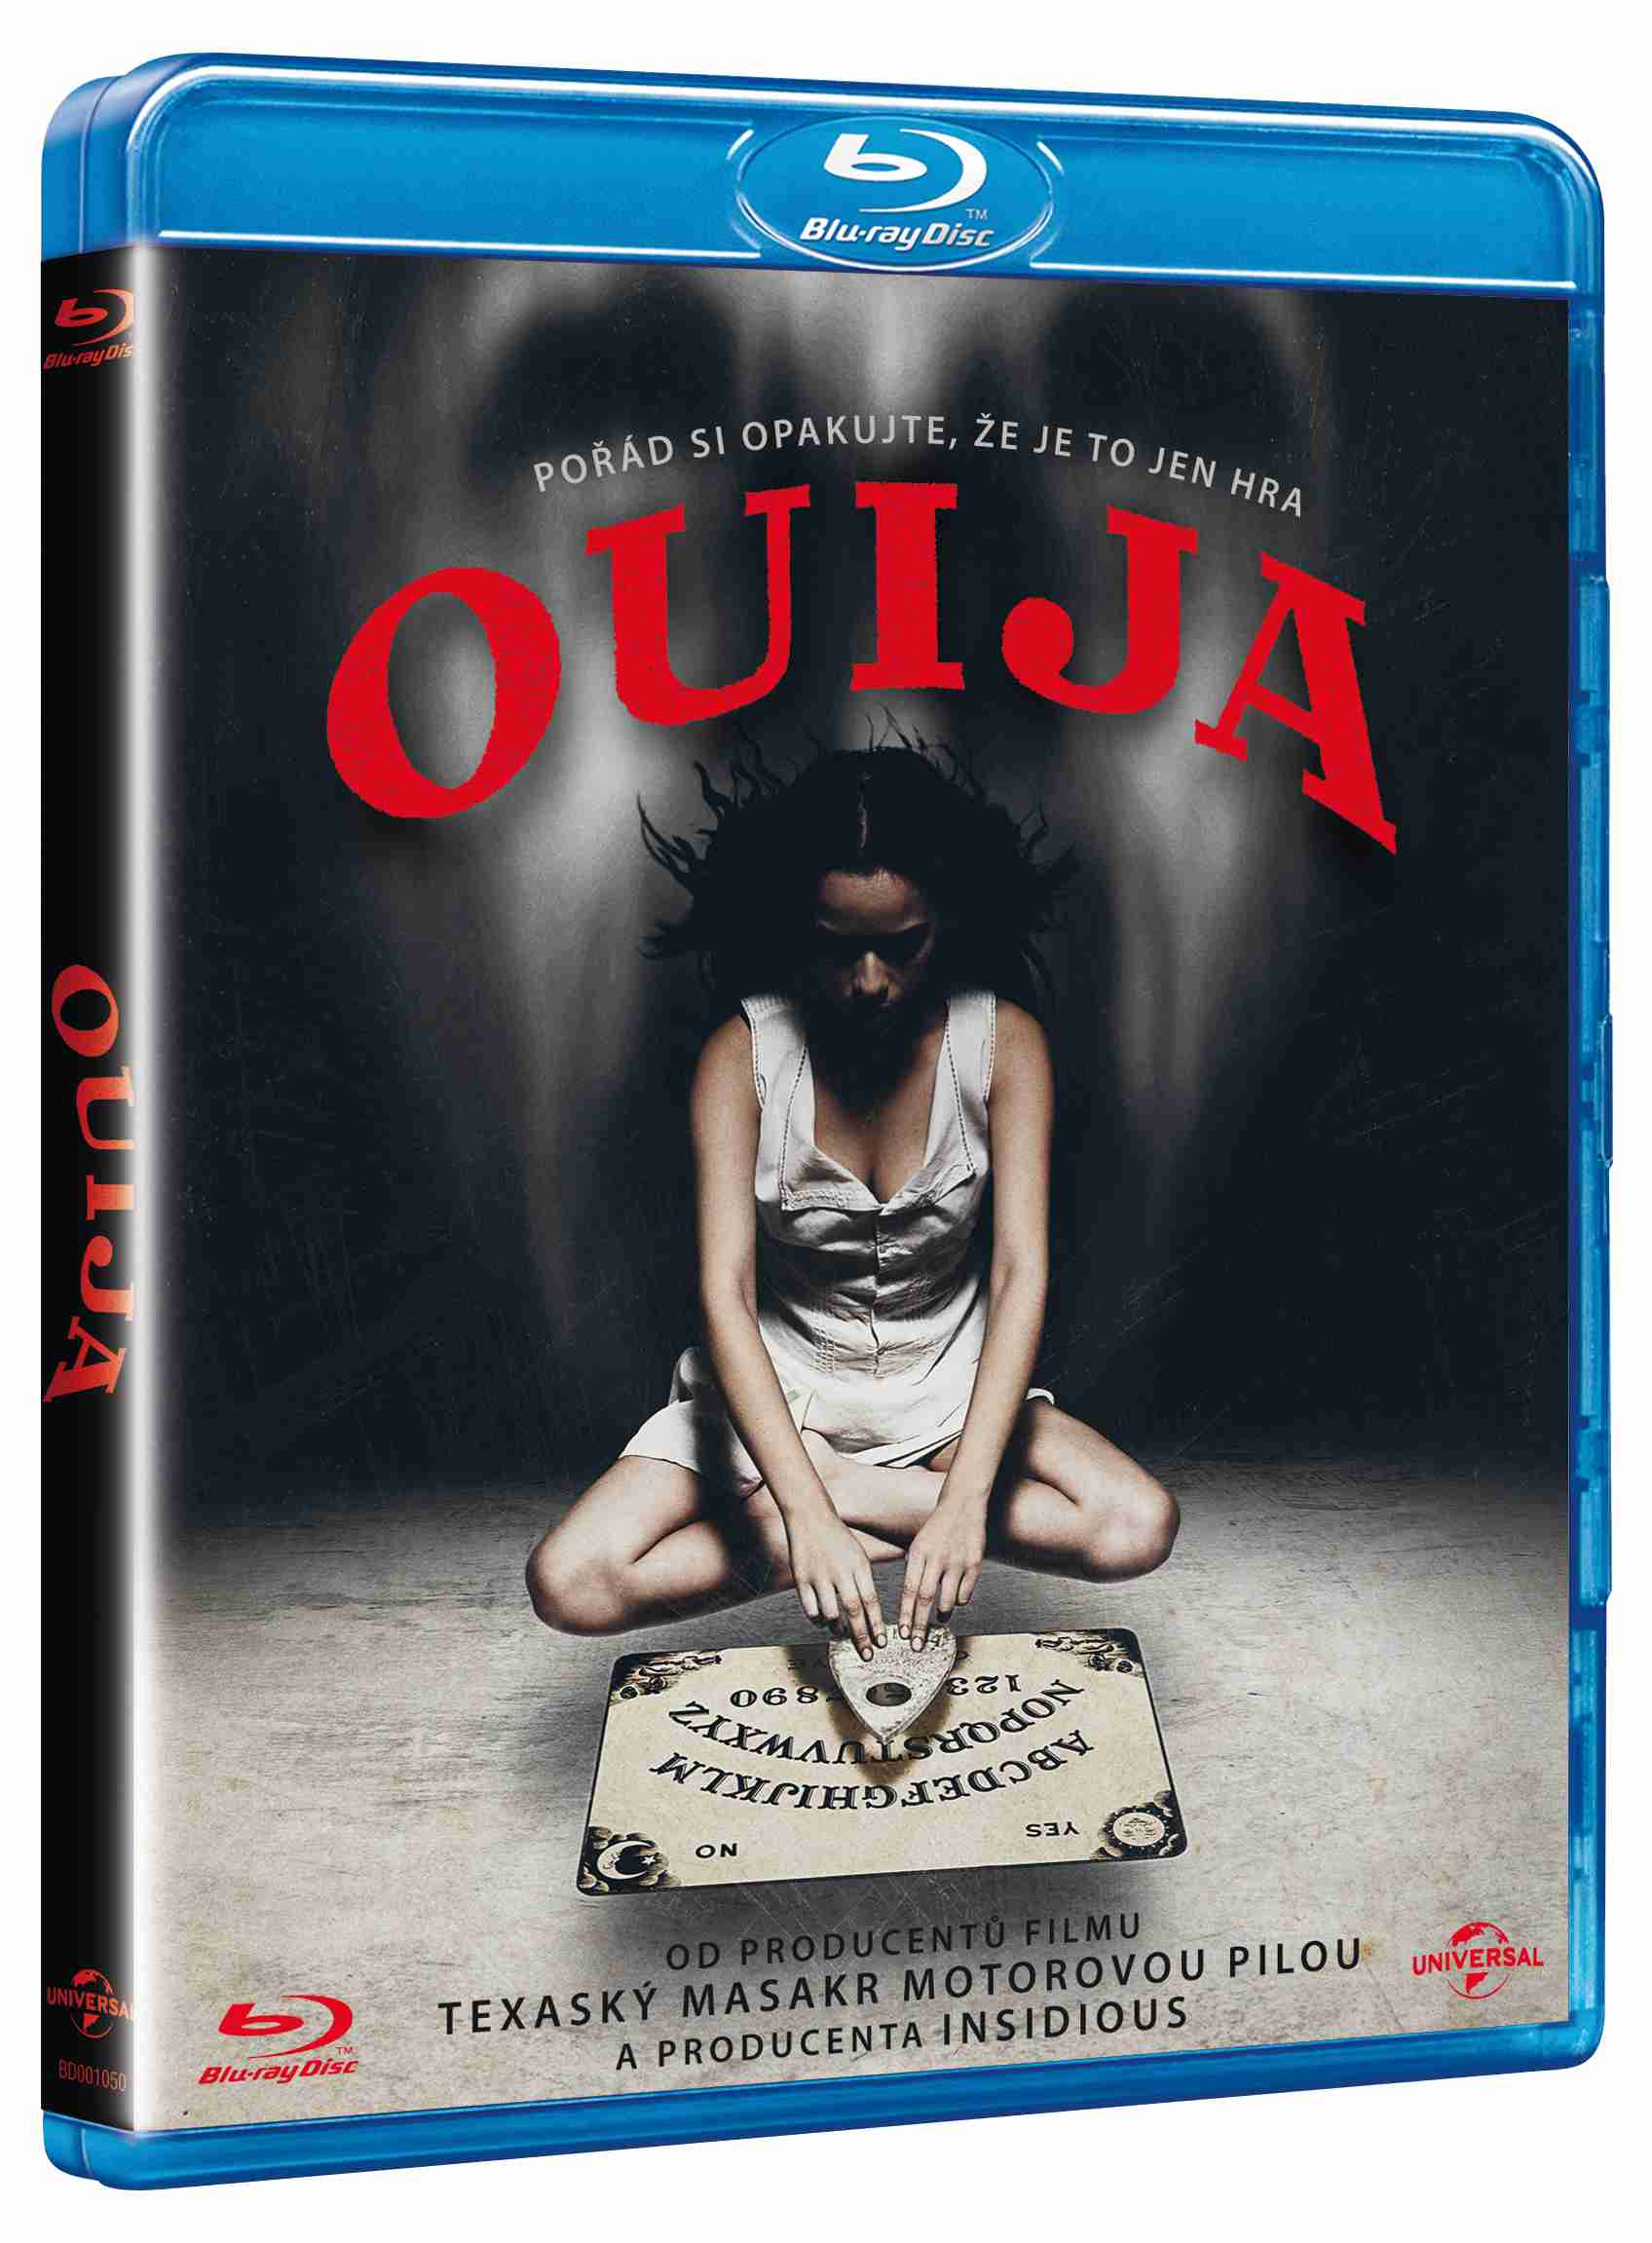 OUIJA - Blu-ray